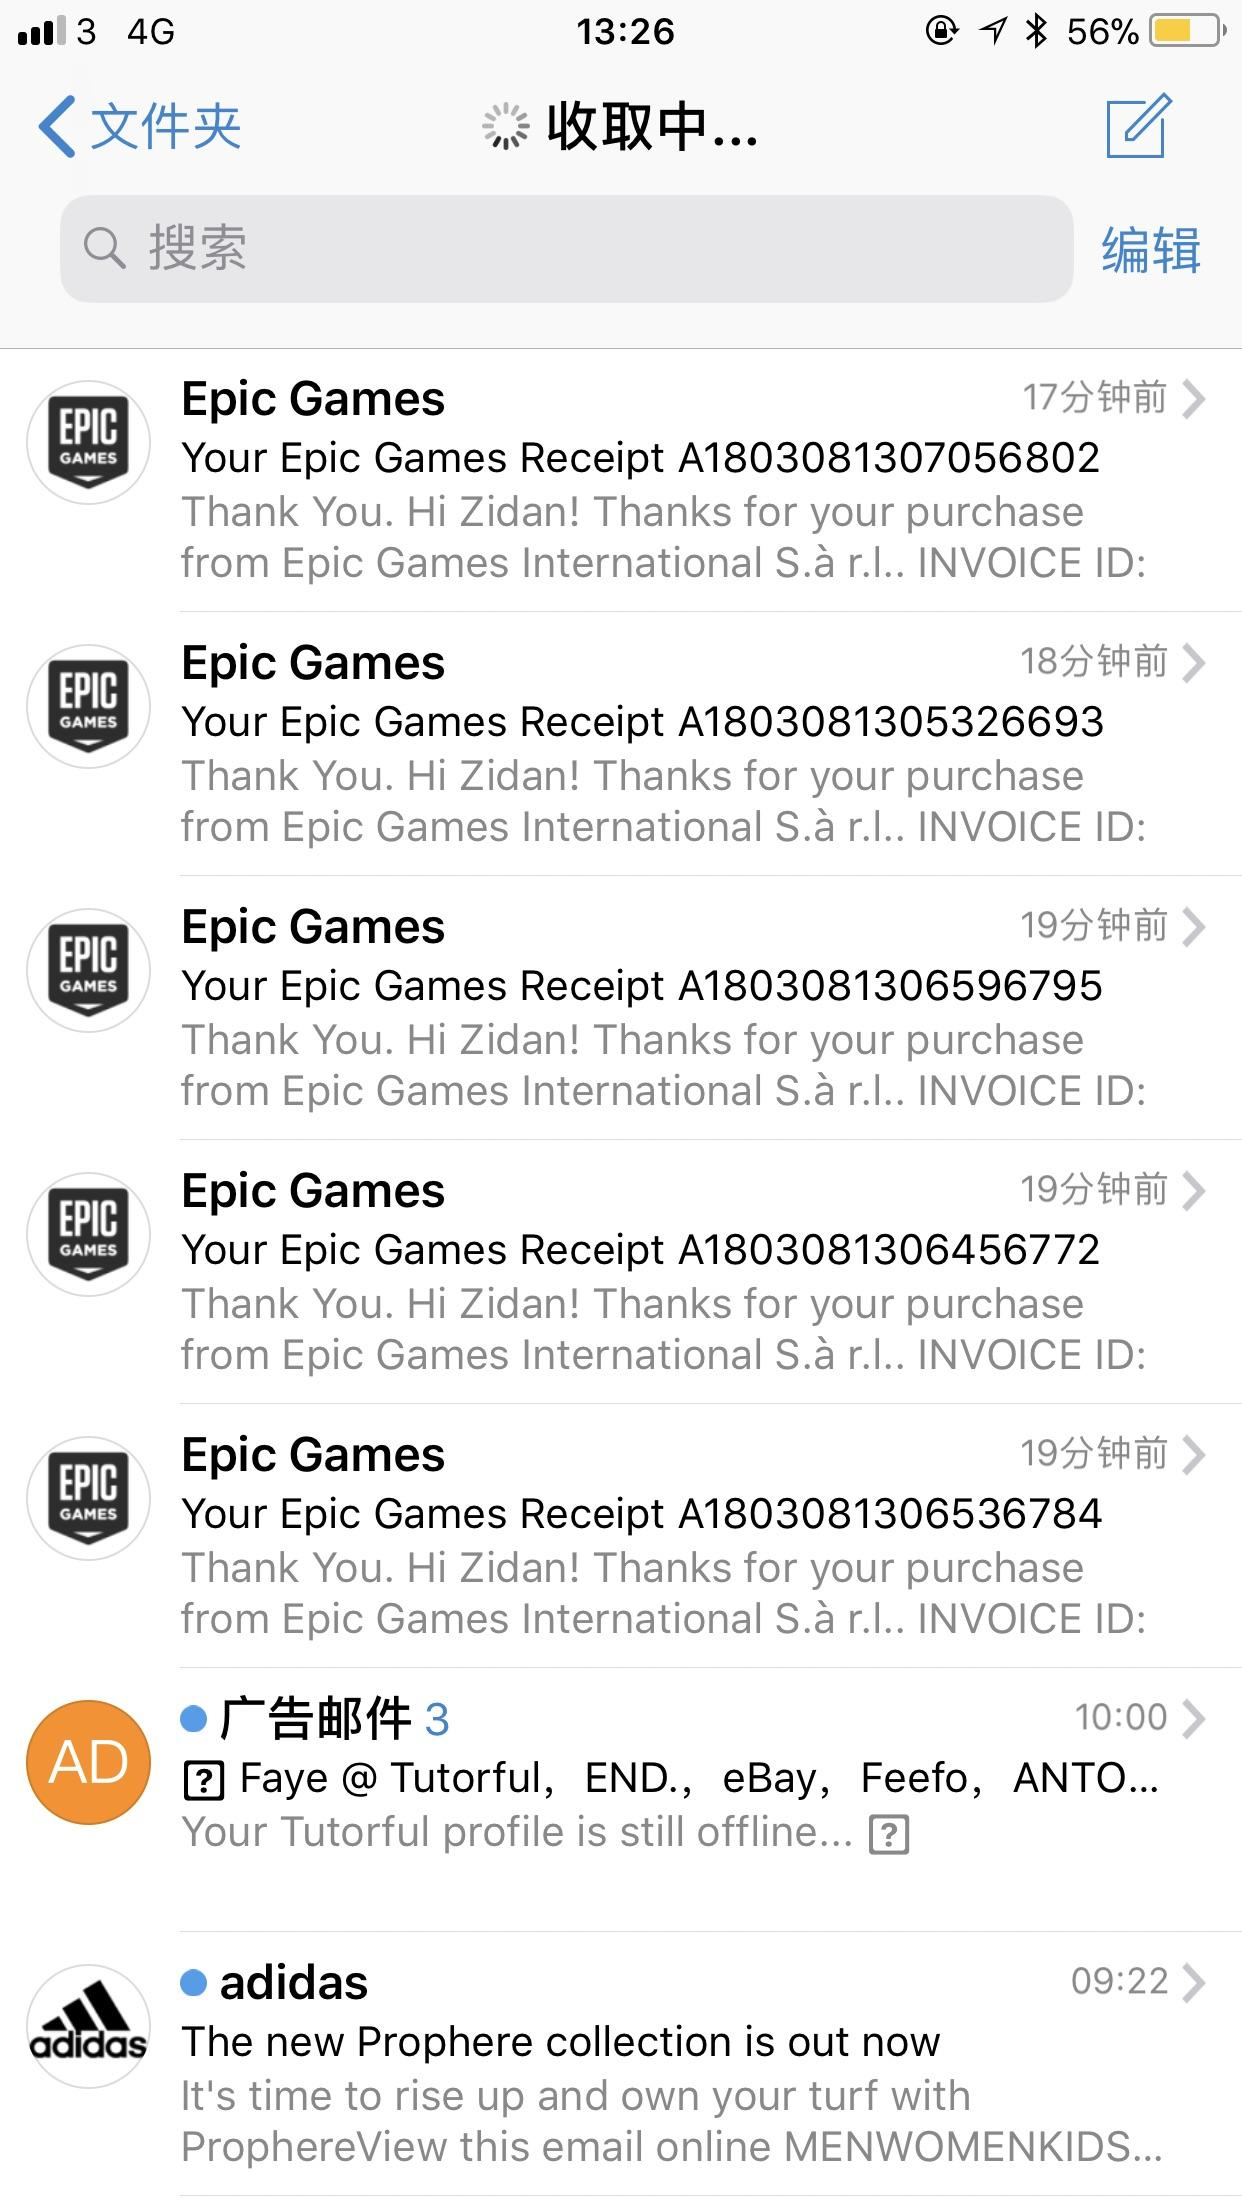 Fortnite epic games herunterladen